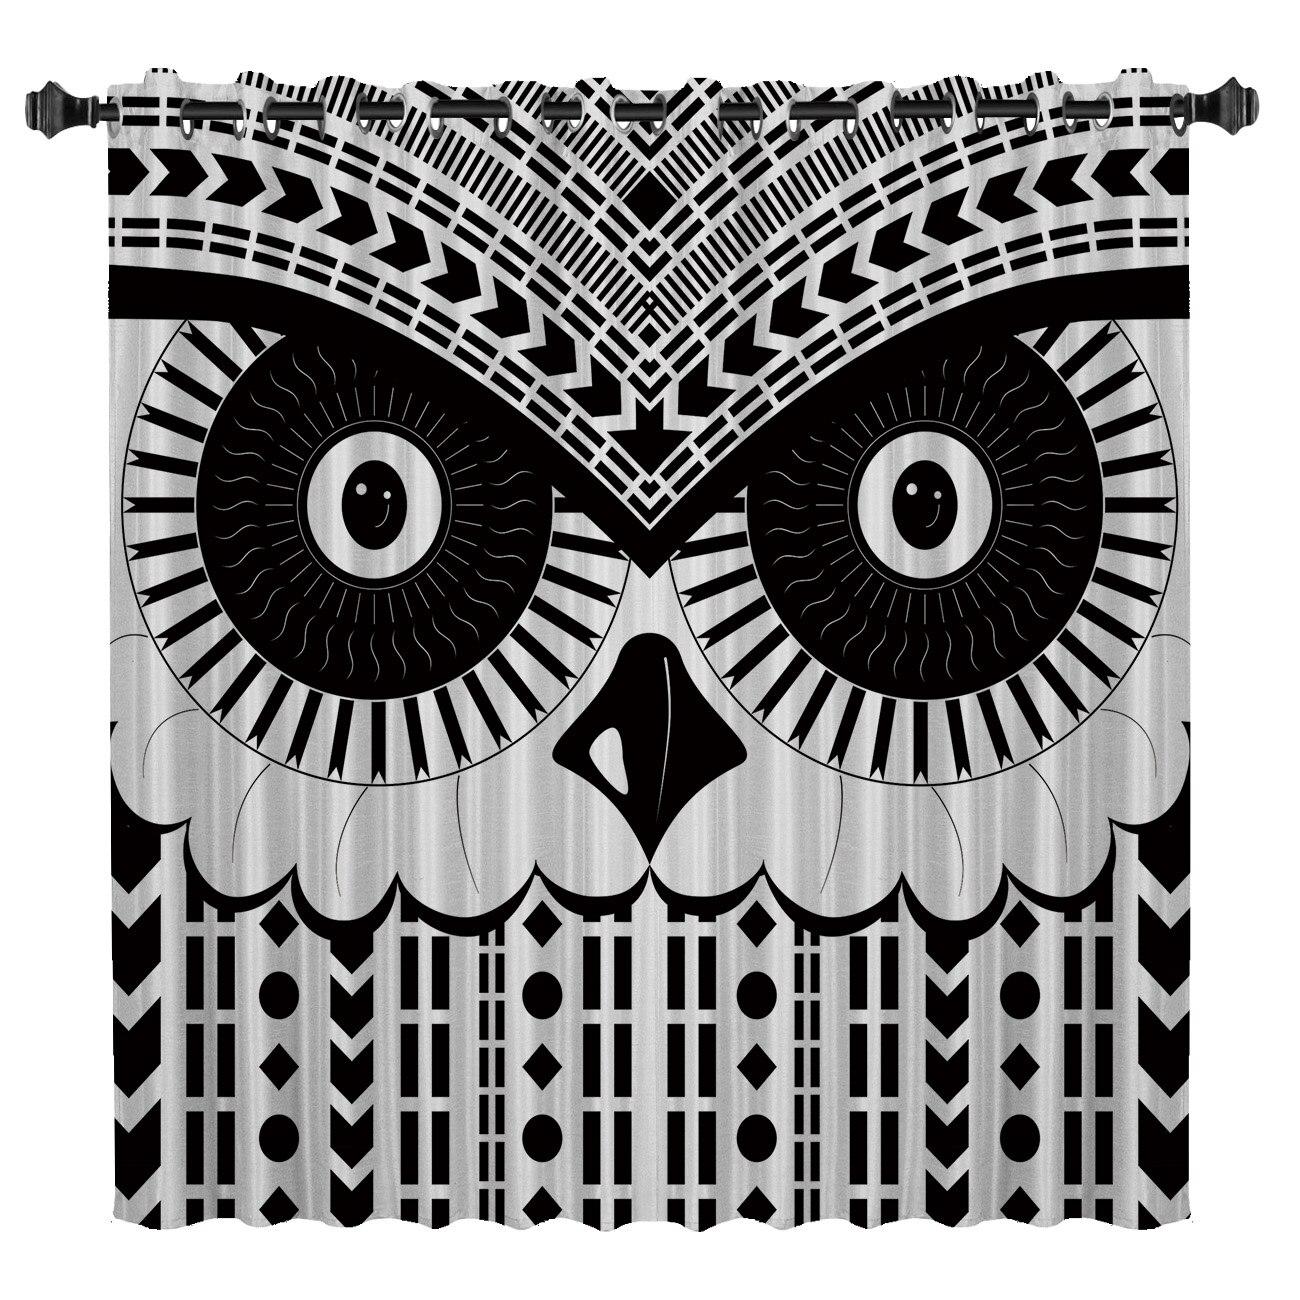 Abstract Geometric Art Owl Pattern Window Treatments Curtains Valance Window Curtains Dark Bathroom Curtains Bedroom Kitchen